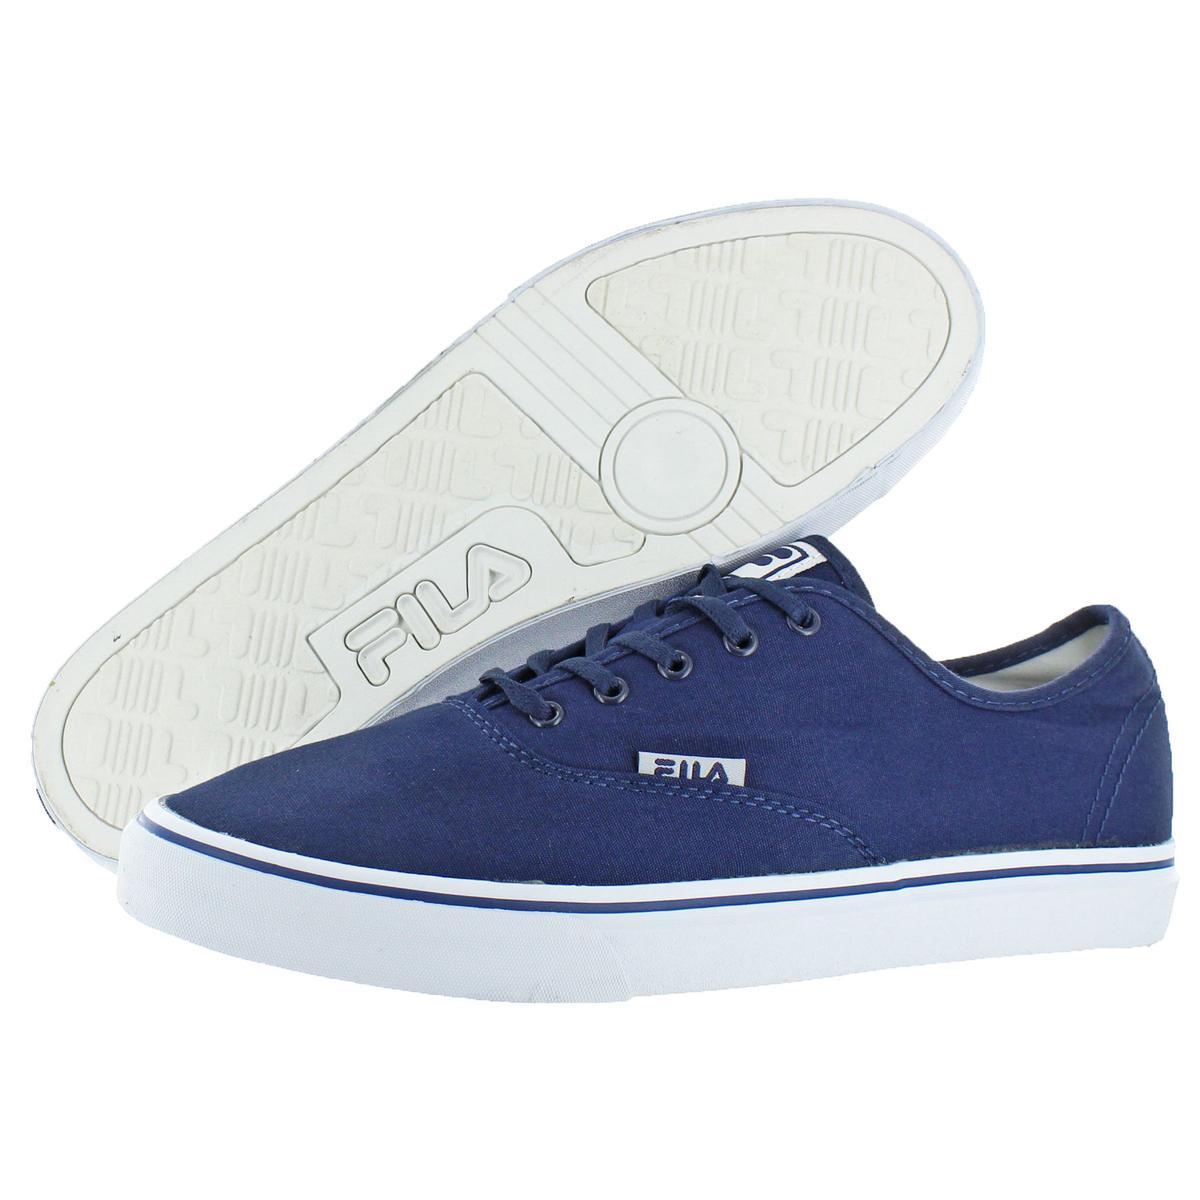 Fila-Classic-Canvas-Men-039-s-Fashion-Skate-Sneakers-Shoes thumbnail 10